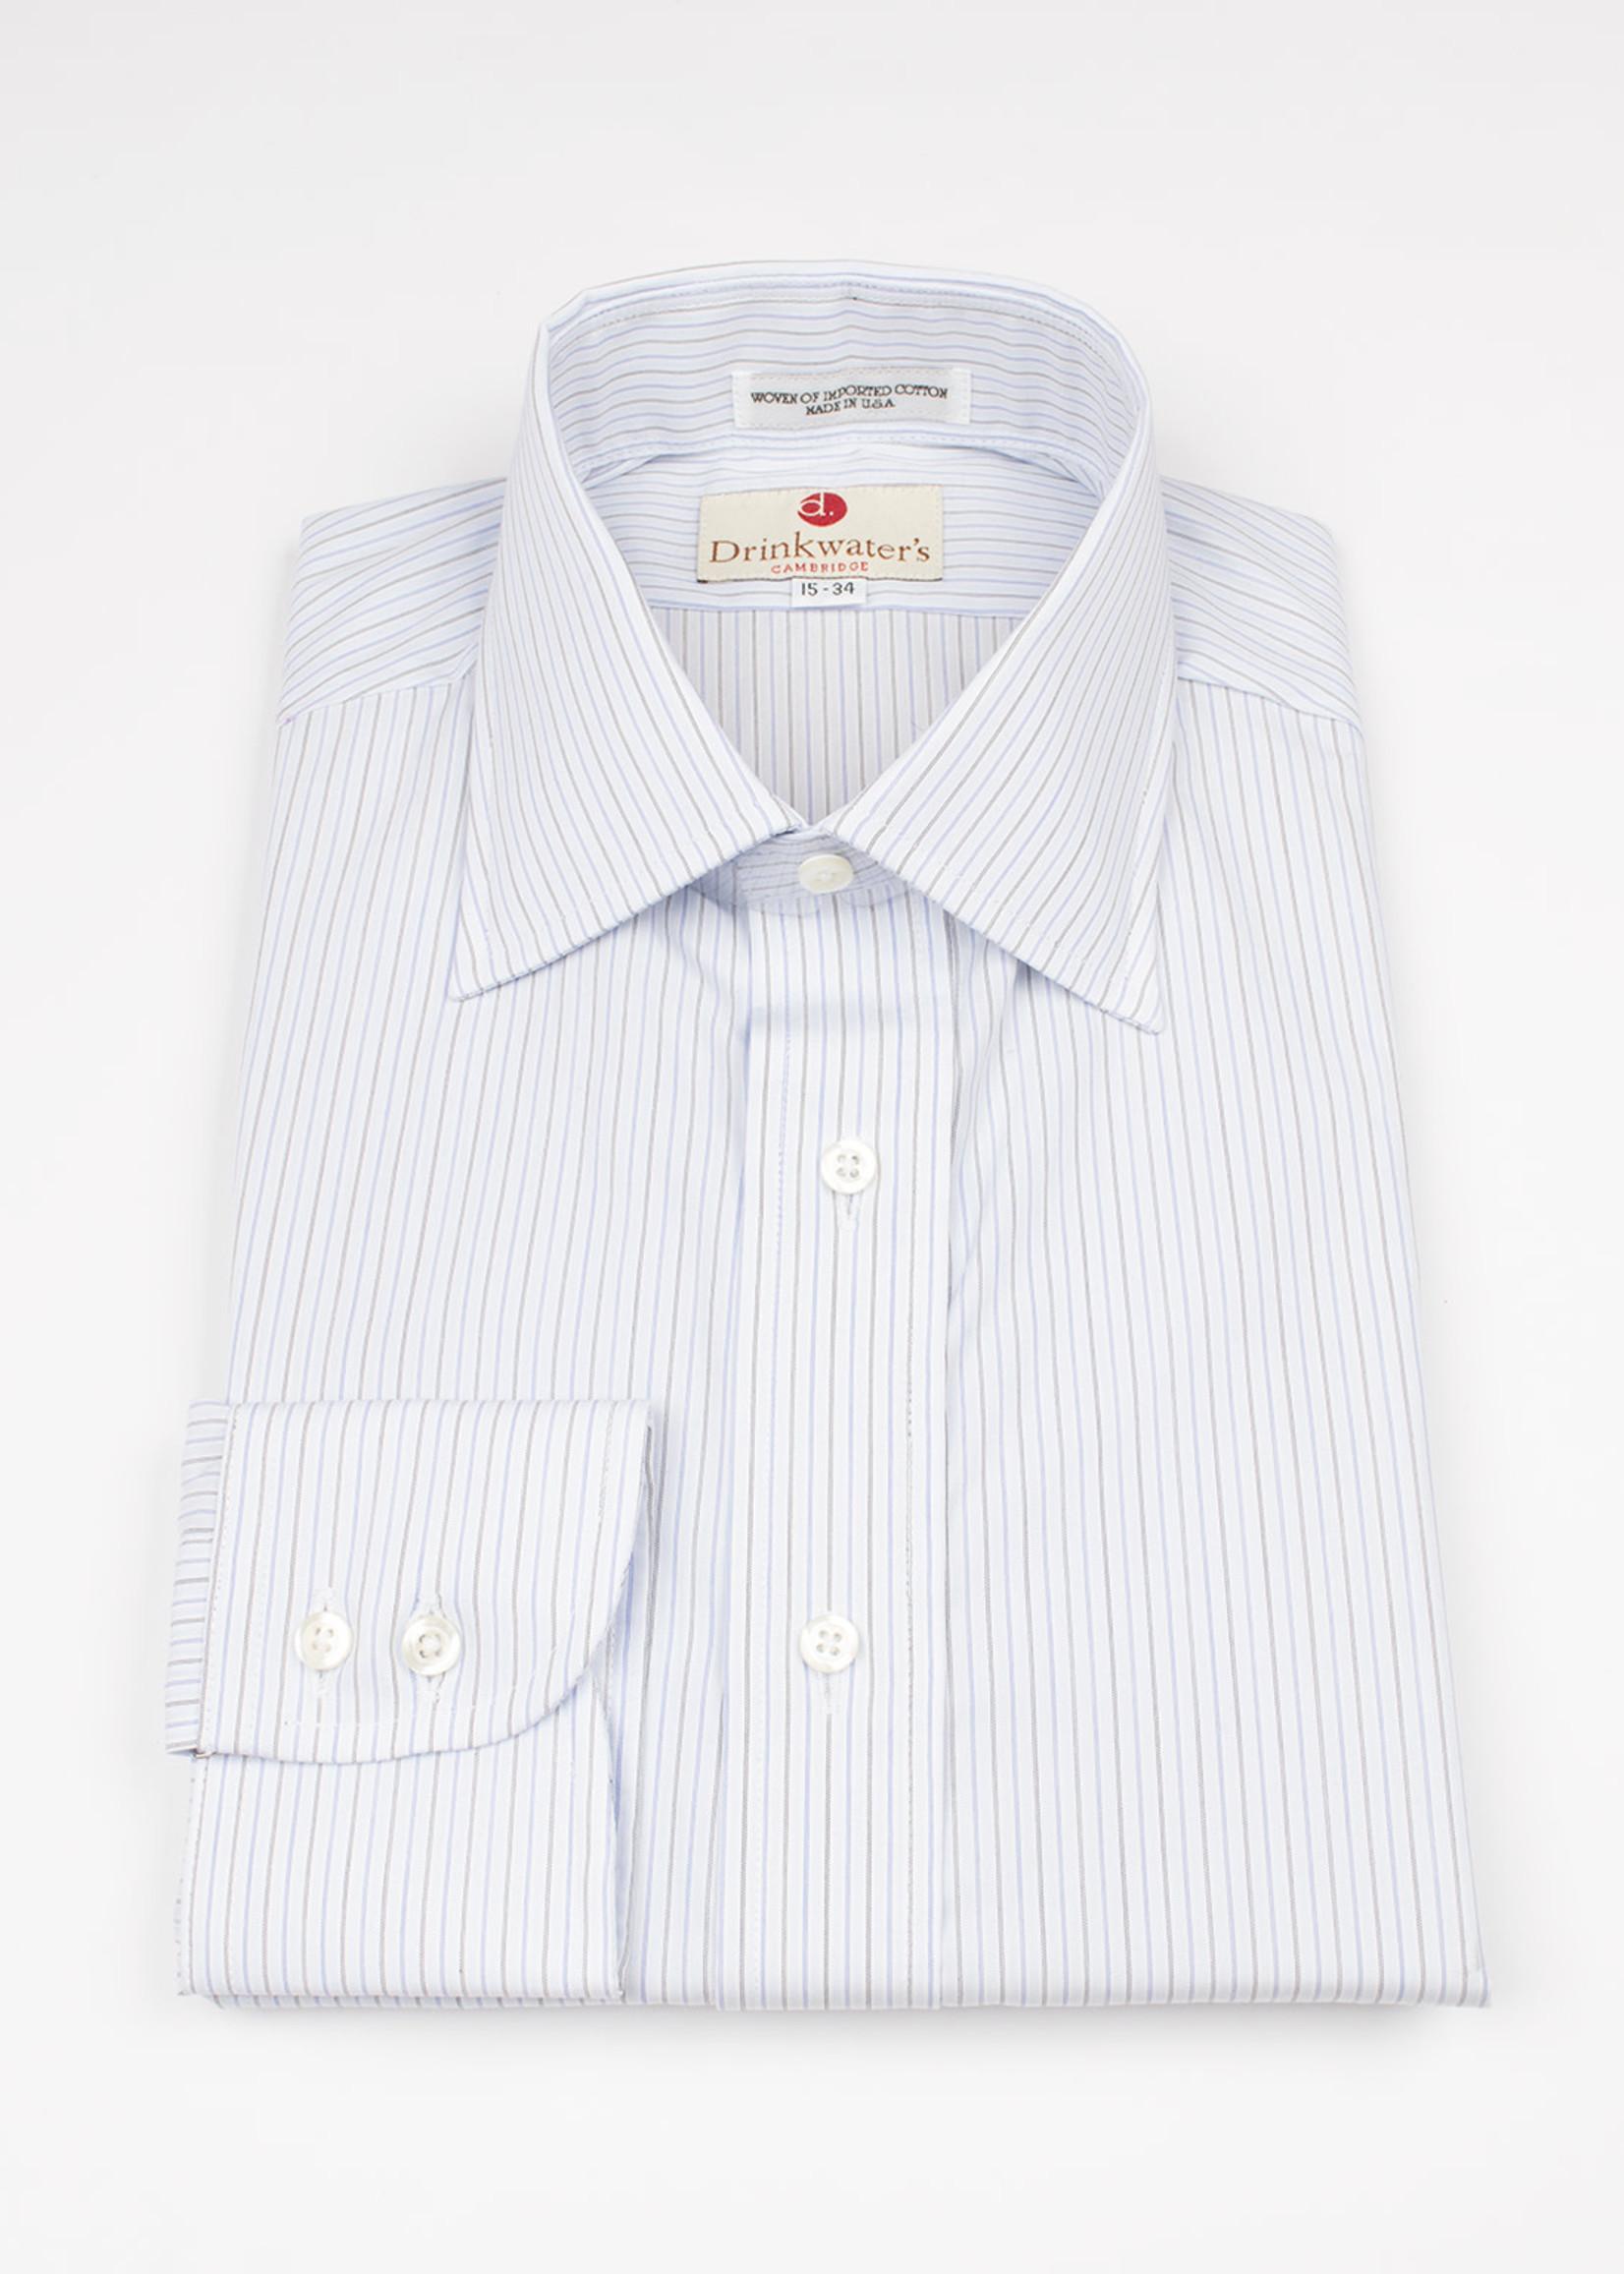 Drinkwater's  Blue w/ Blue/Olive Antique Stripe Spread Collar